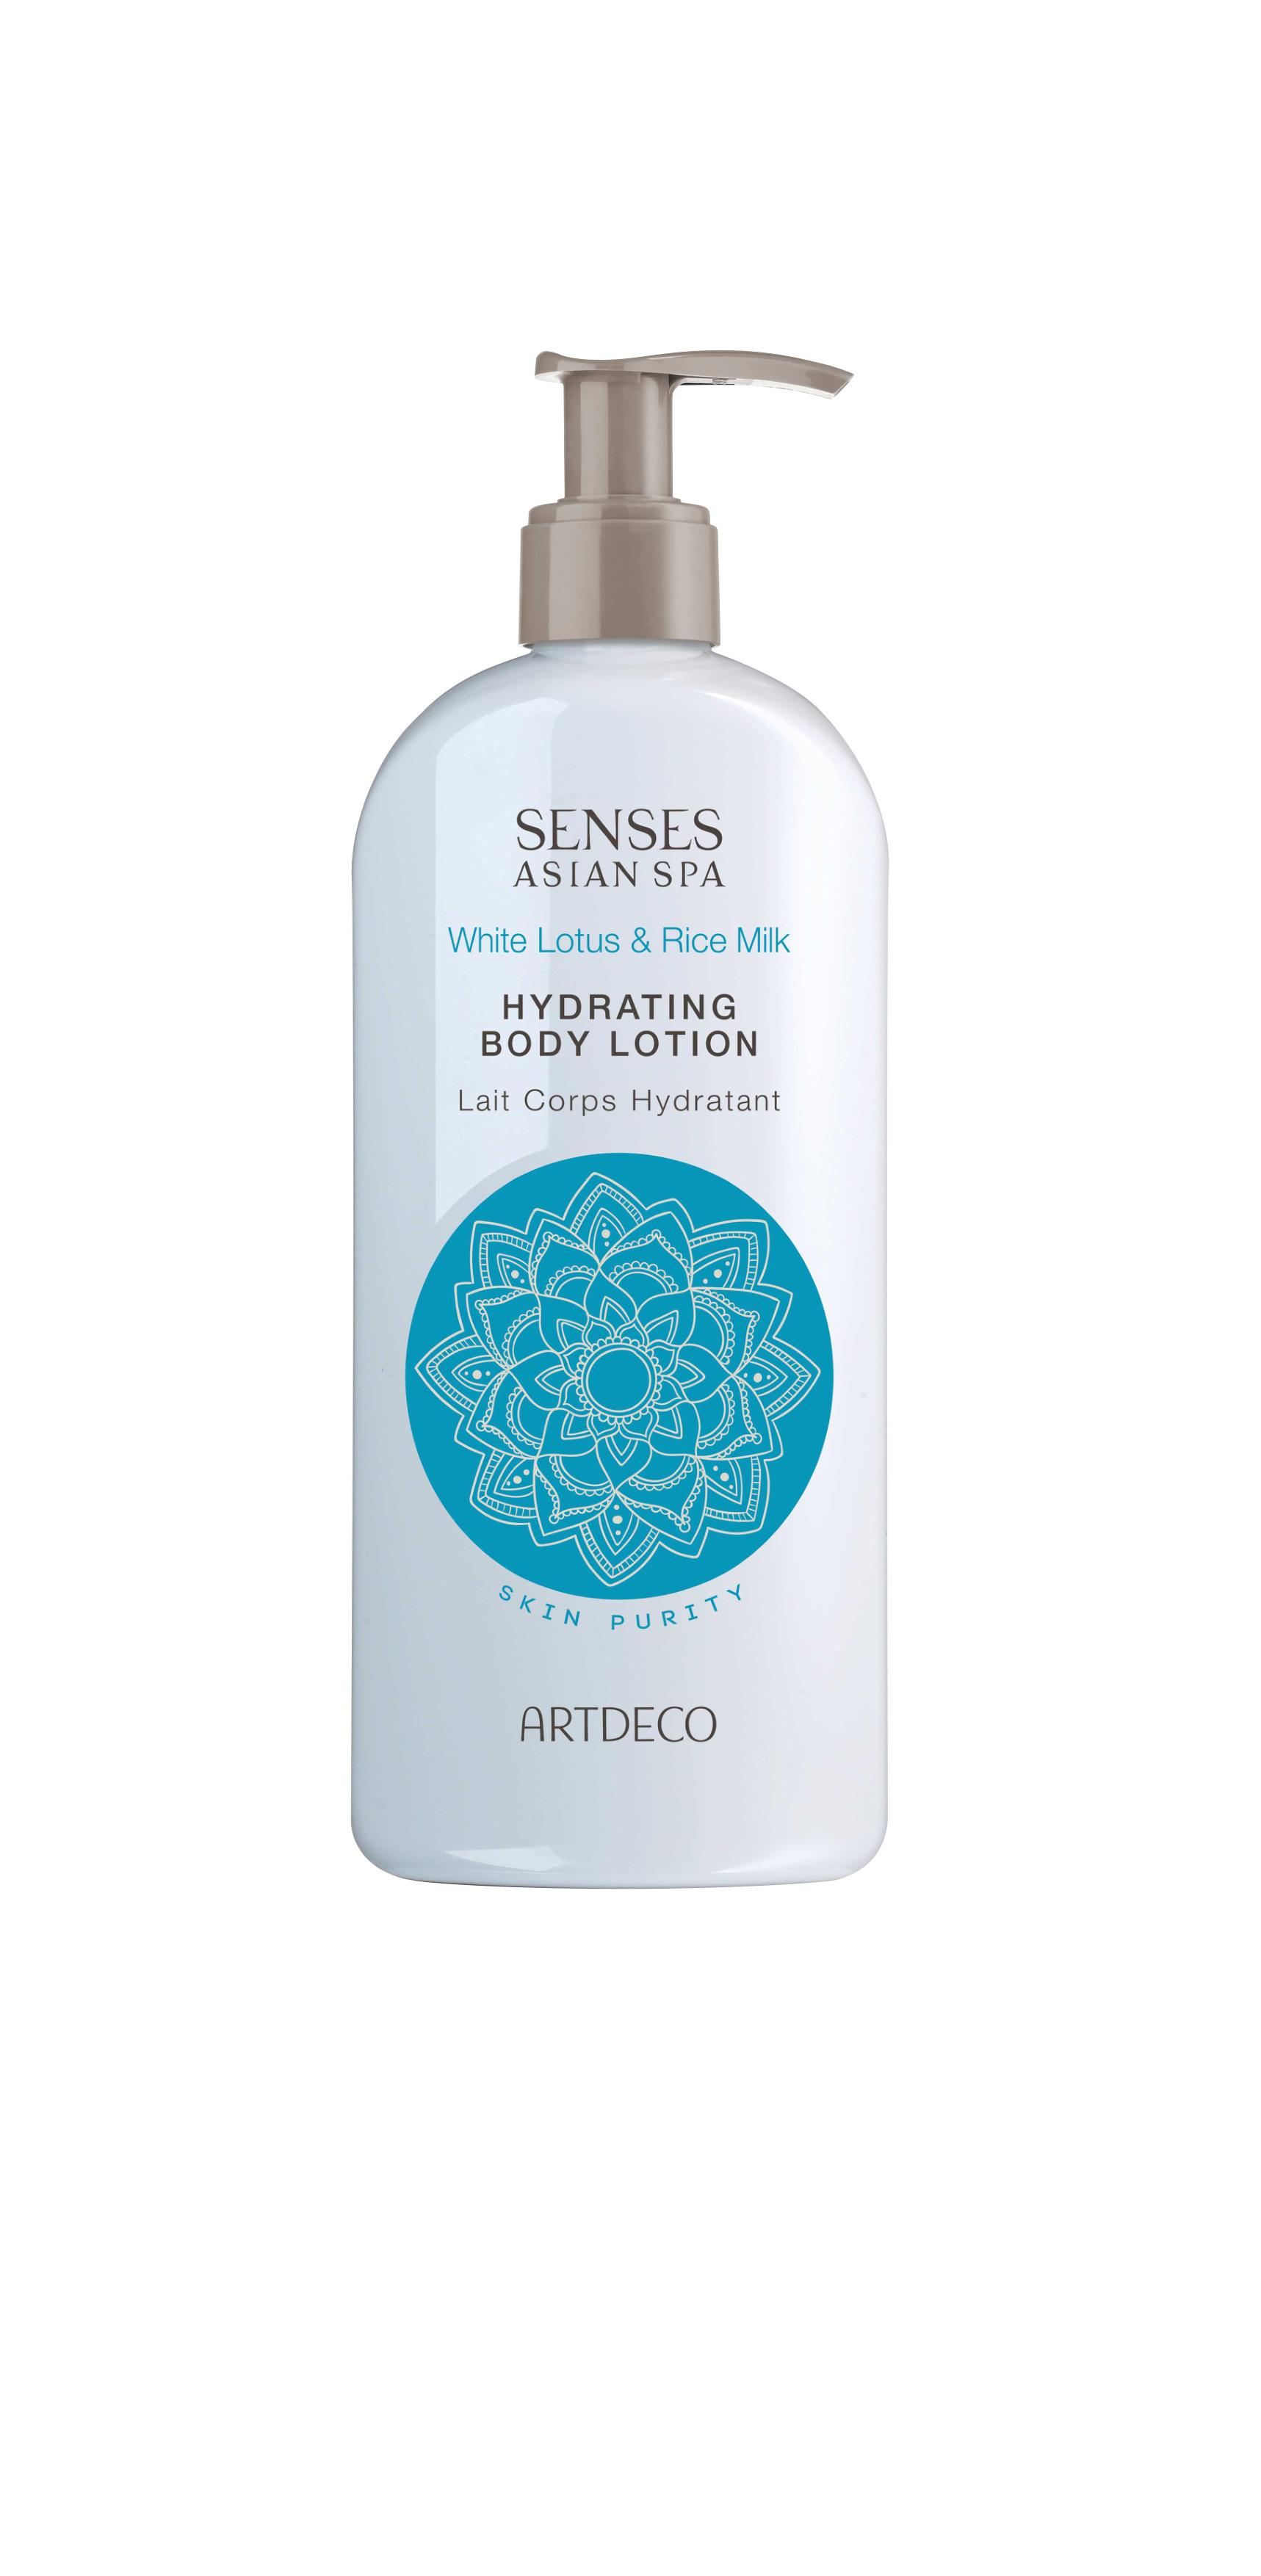 Artdeco лосьон для тела увлажняющий Hydrating body lotion, skin purity, 200 мл72523WDЛегкая, быстро впитывающаяся текстураУвлажняет кожуДарит ощущение свежести